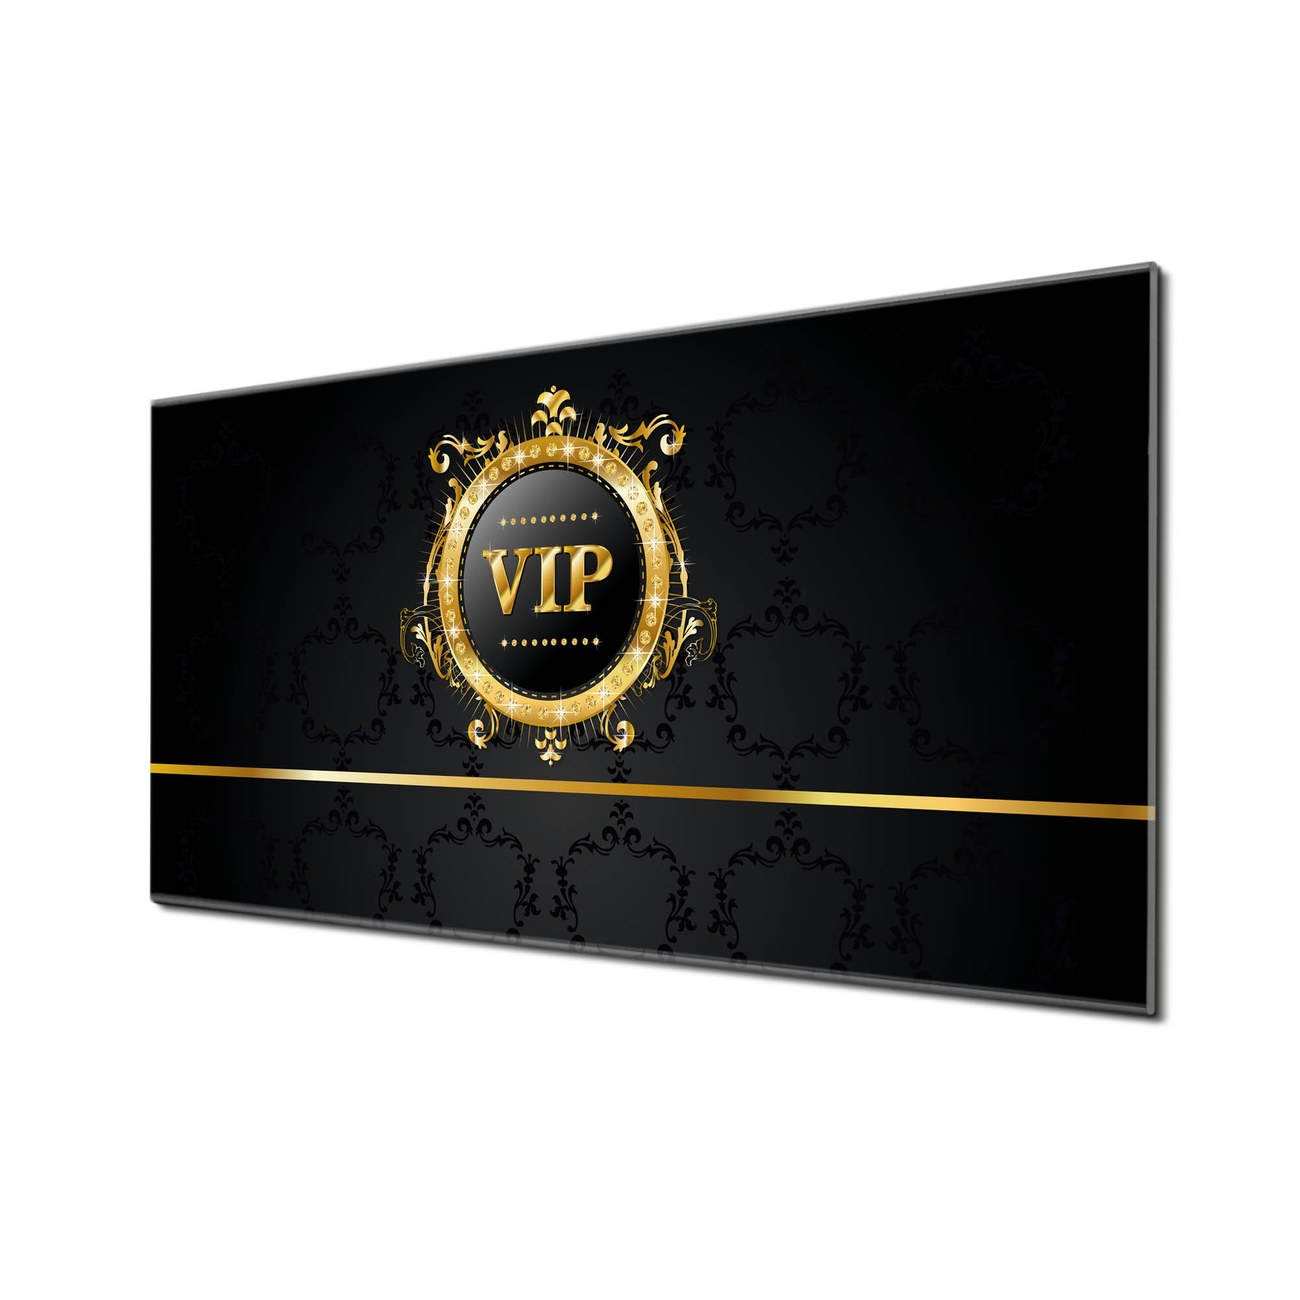 Küchenrückwand Glas Motiv VIP